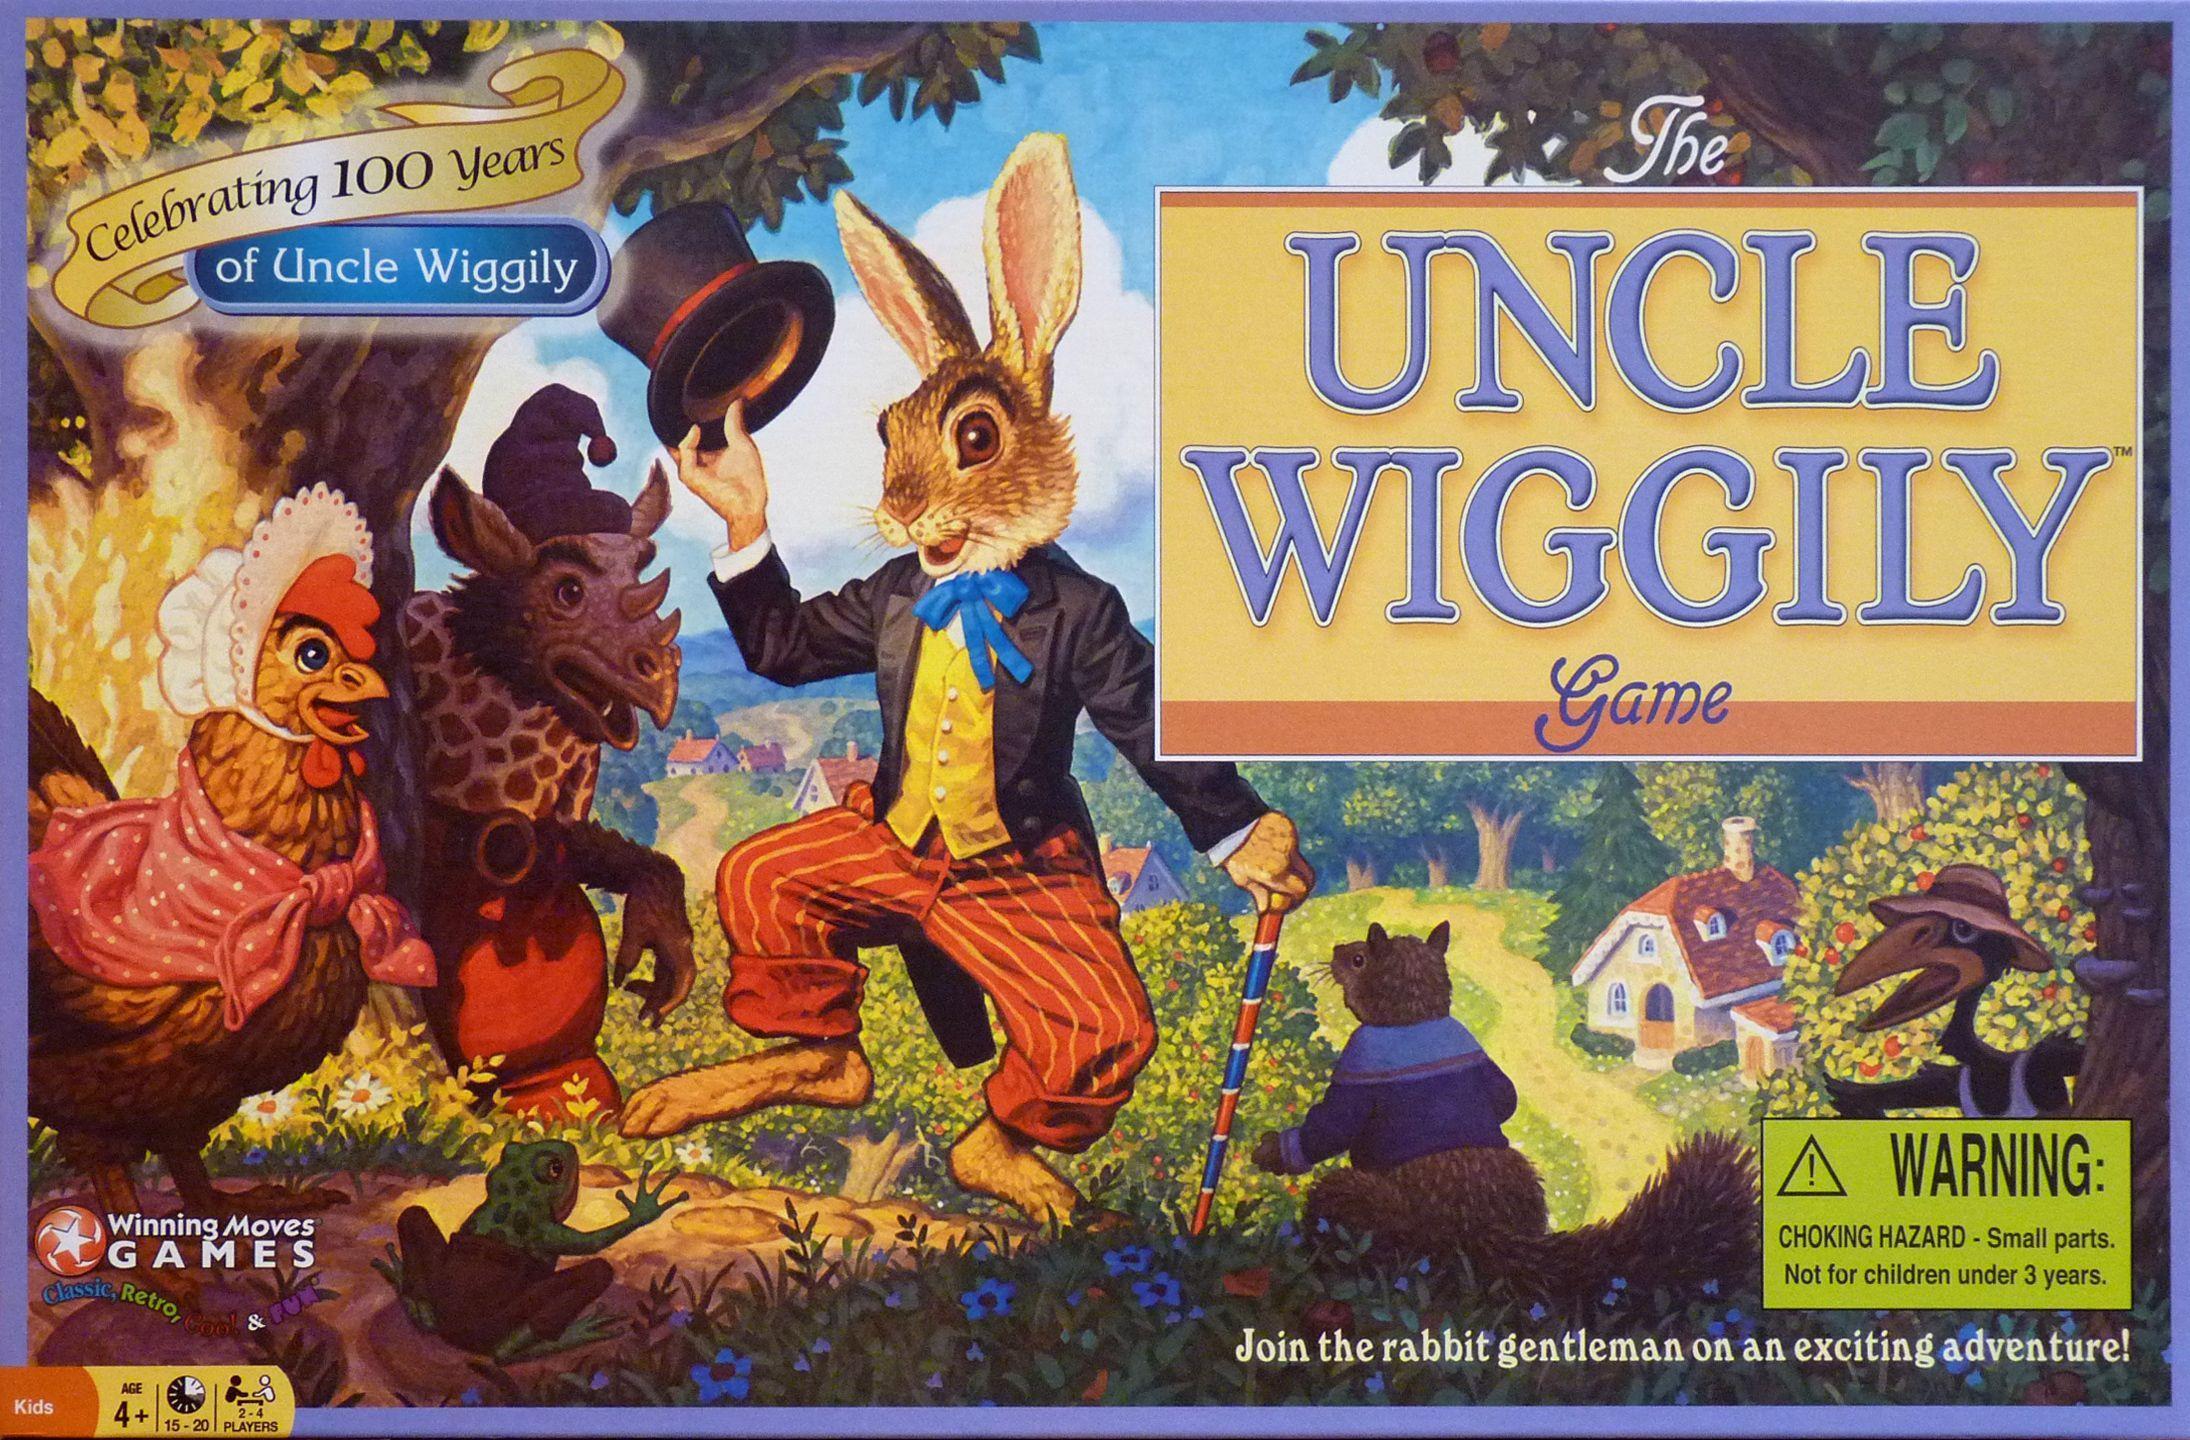 Uncle Wiggily